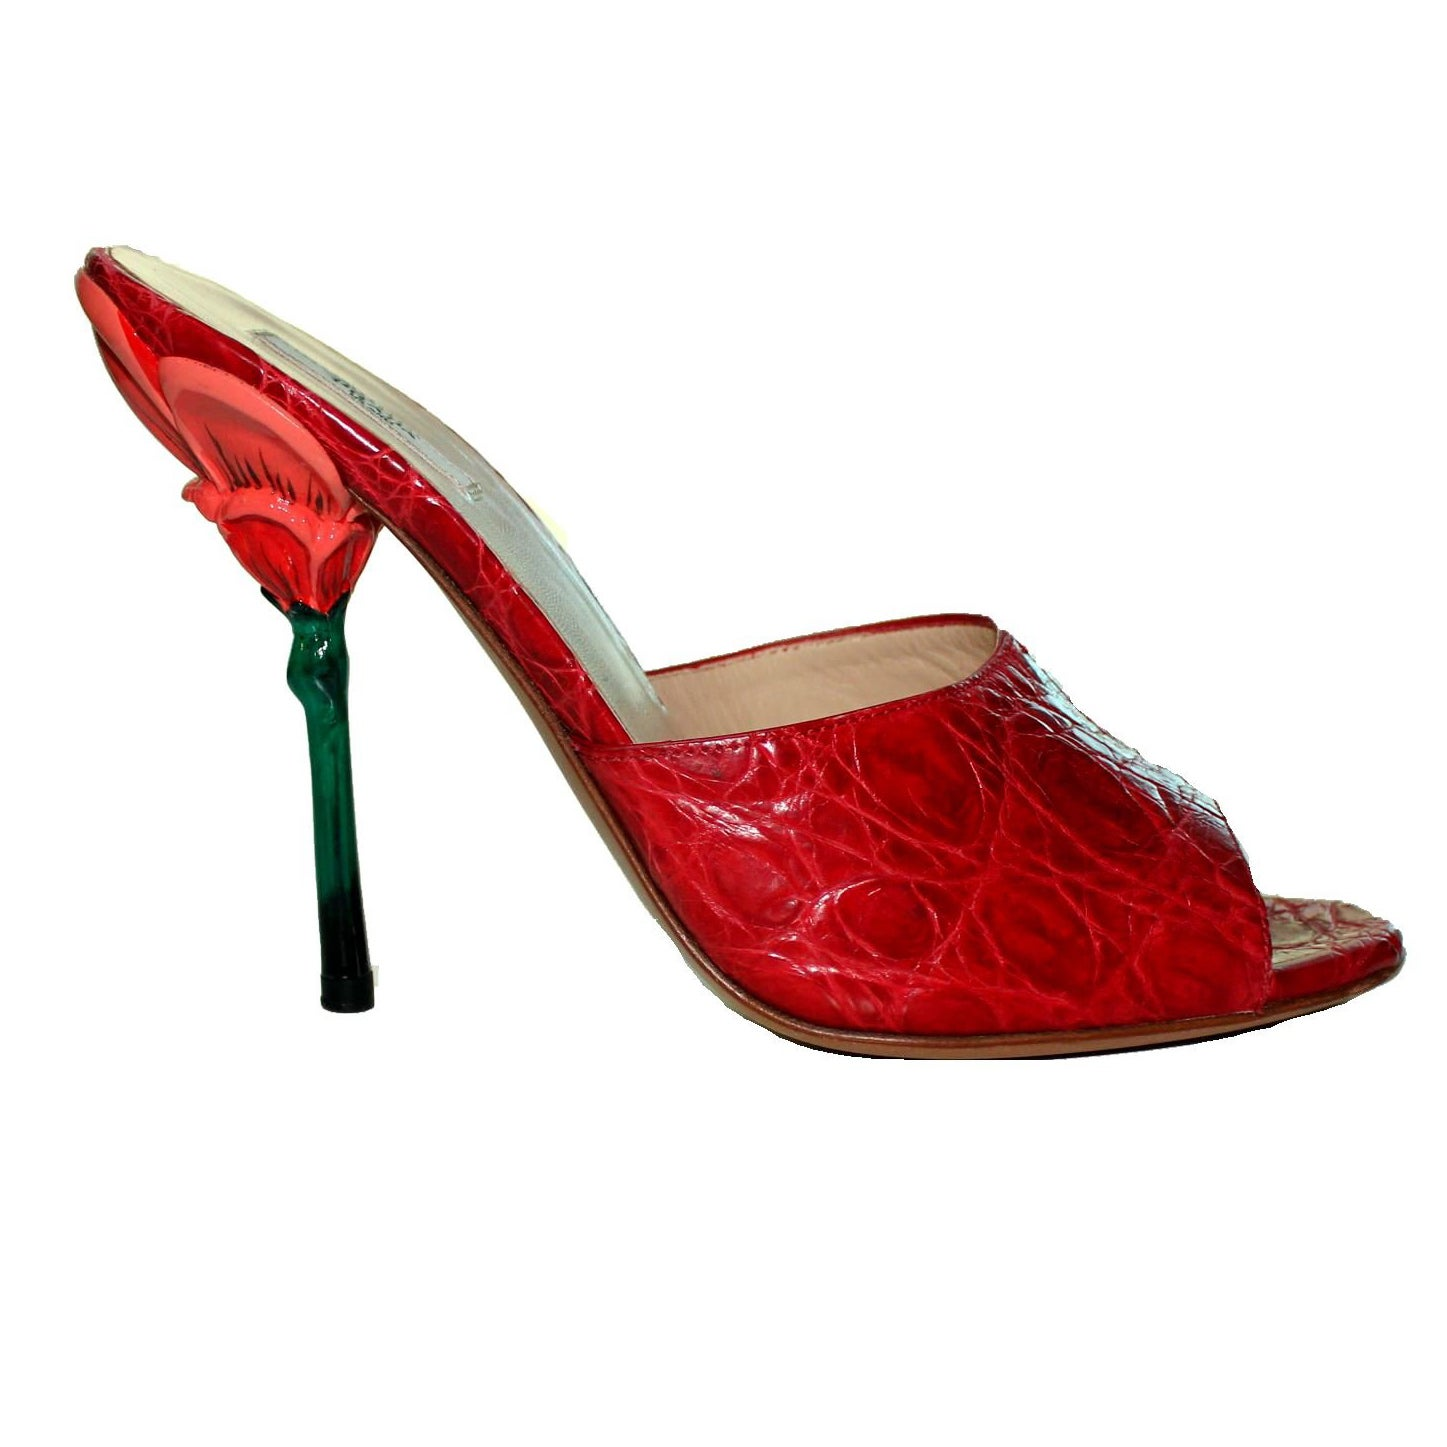 77b2d847725c7 Hand-painted Prada Red Exotic Flower High Heel Sandals